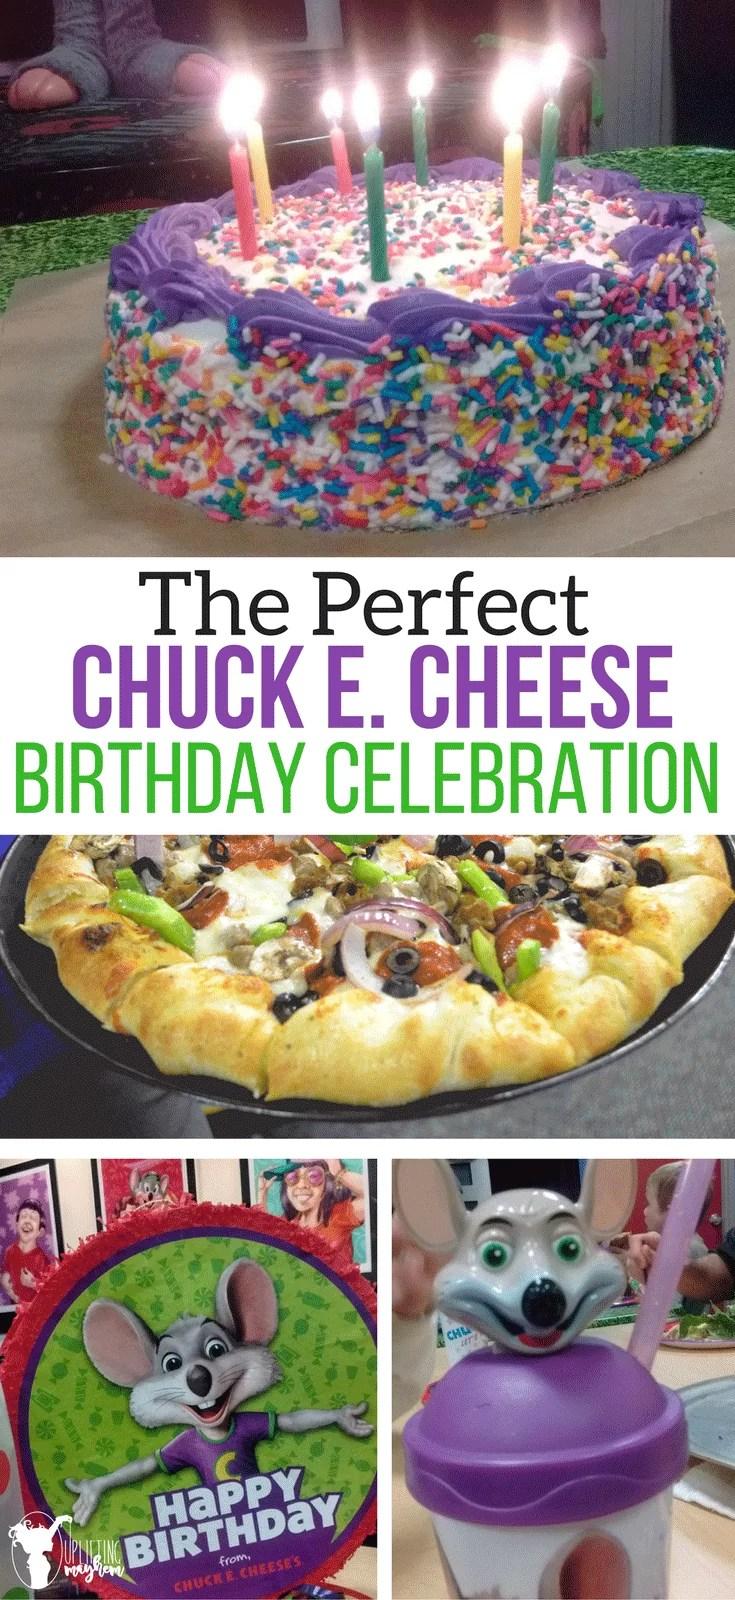 The Perfect Chuck E. Cheese Birthday Celebration